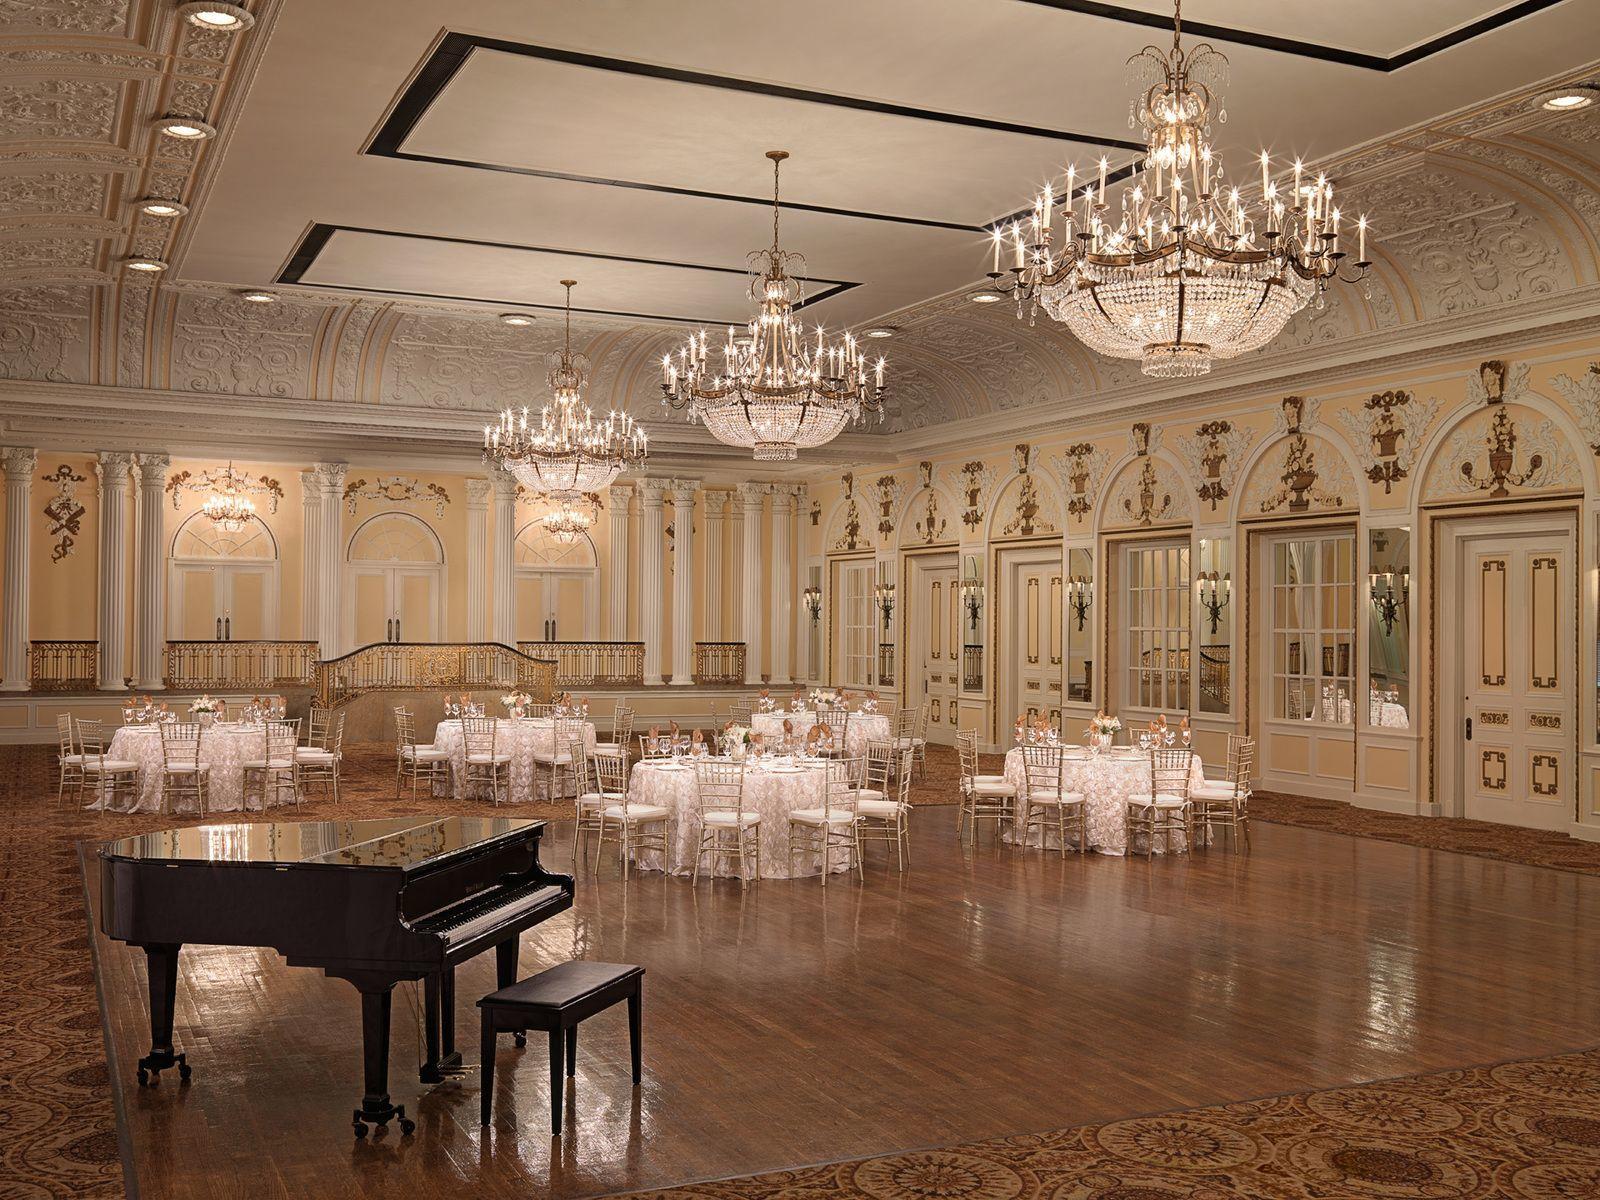 Continental Ballroom with grand piano